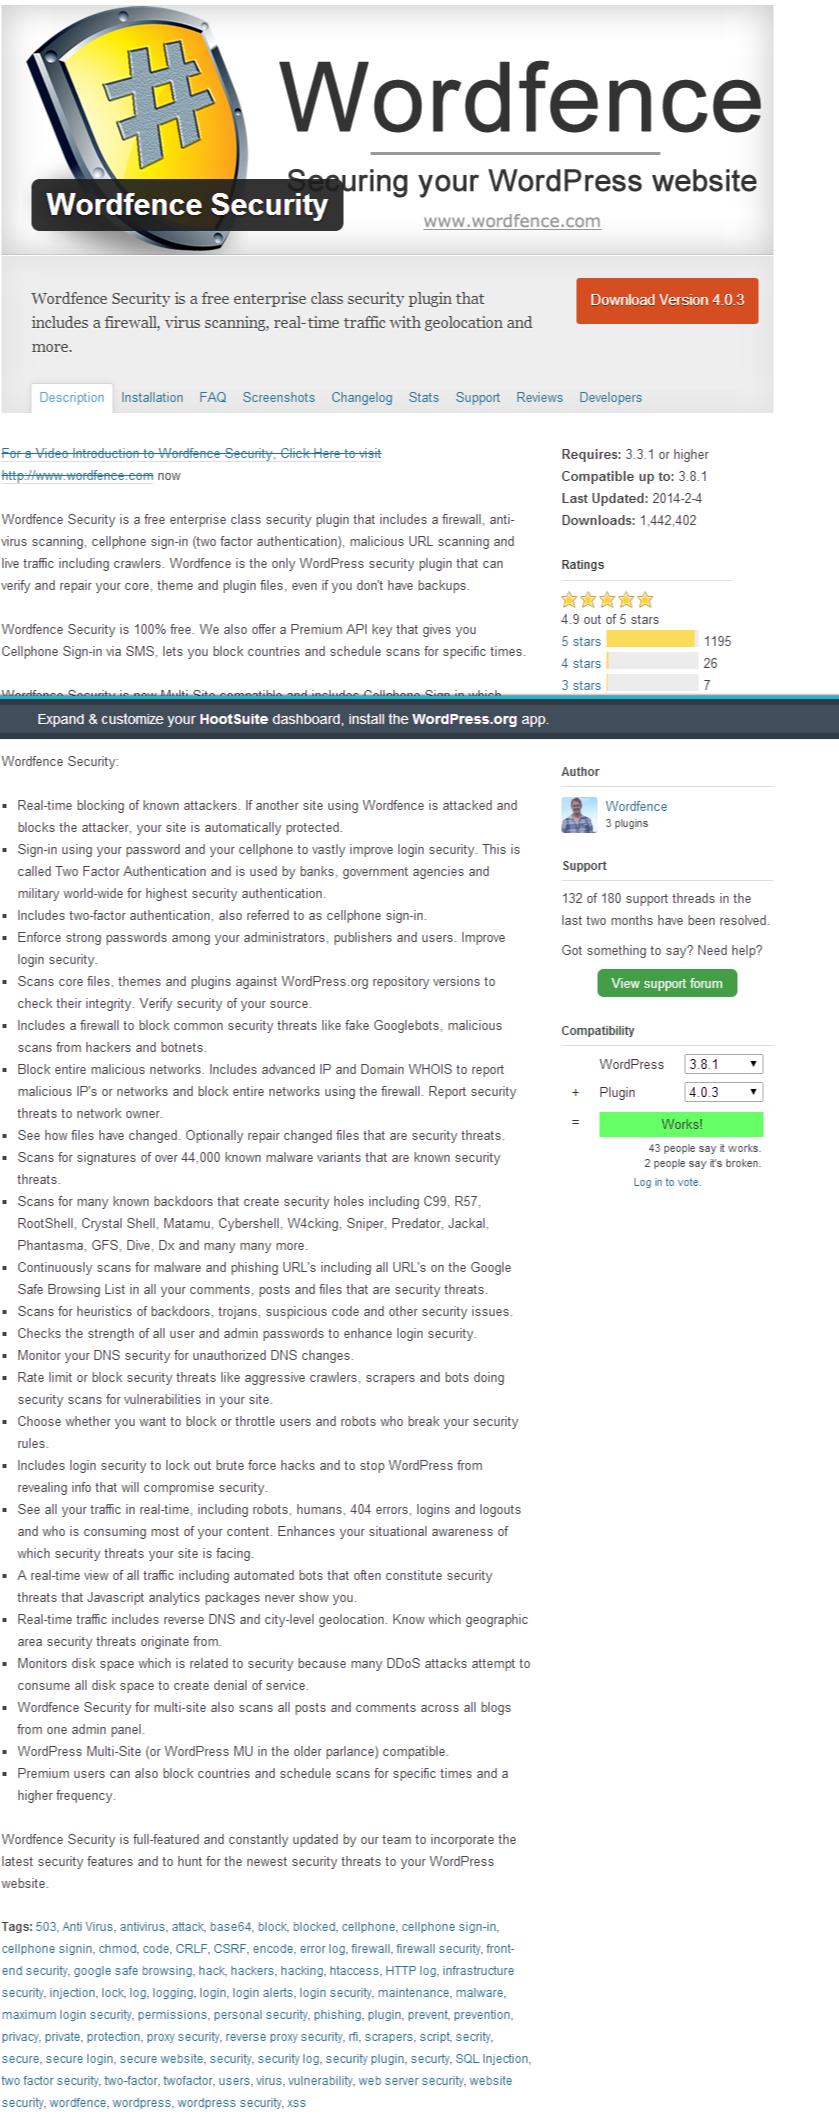 Wordfence for WordPress Security